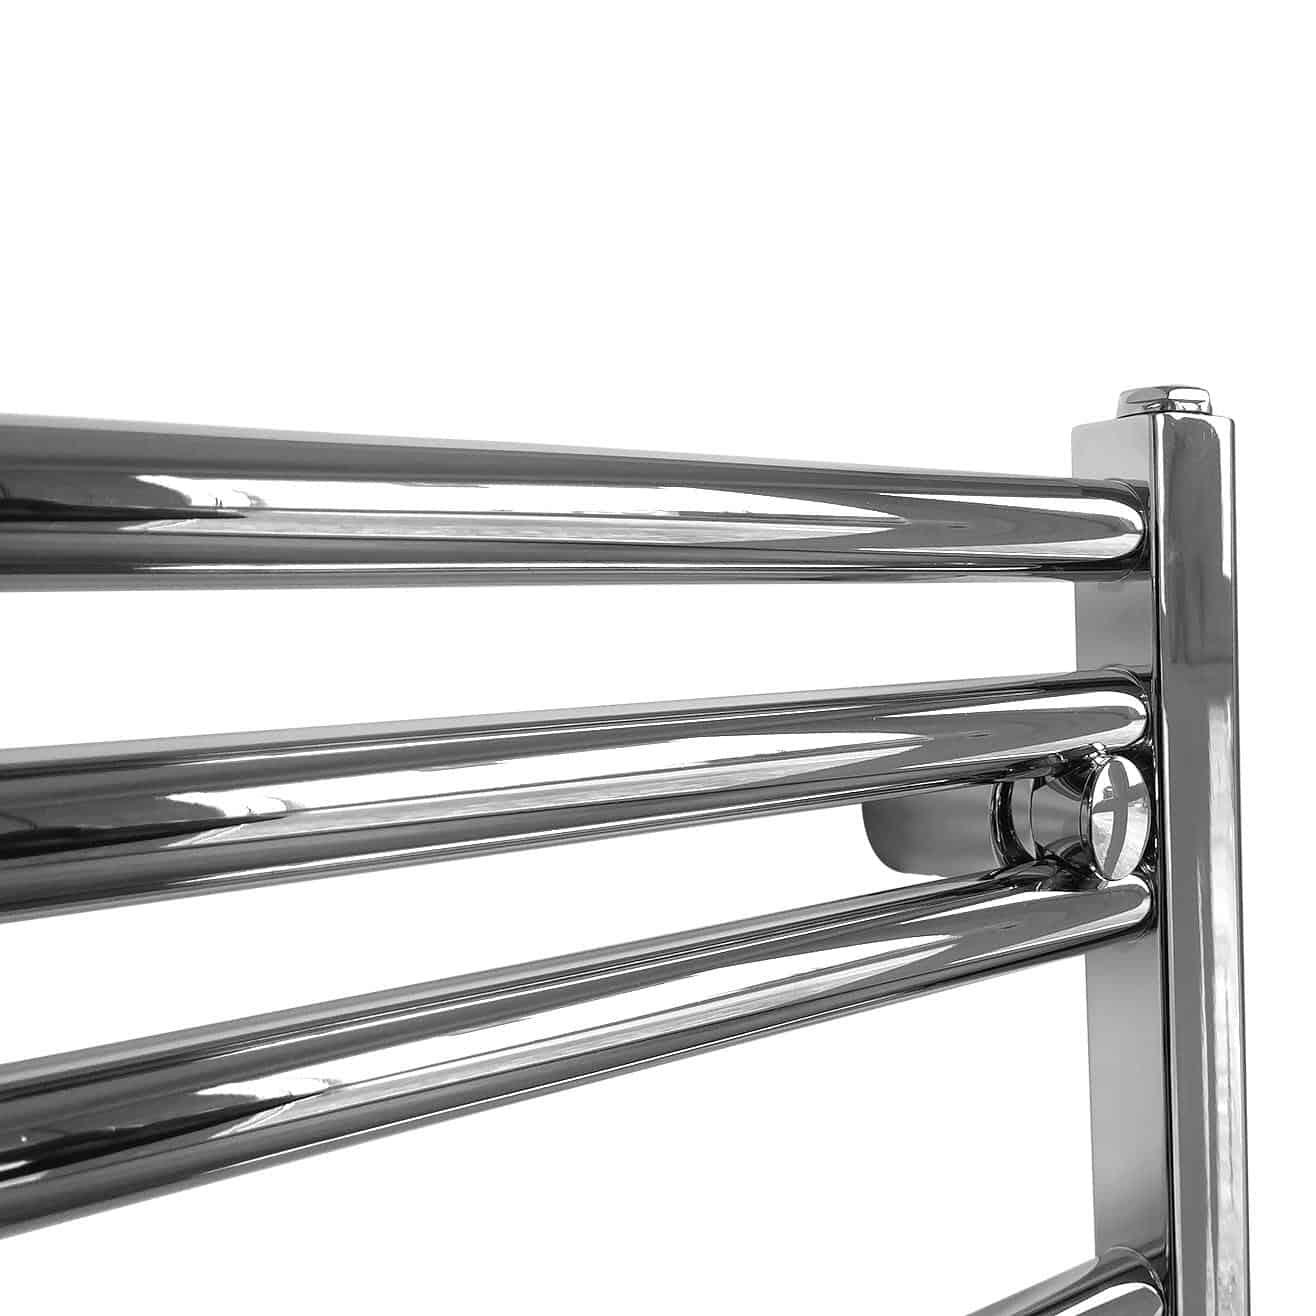 Heated Towel Rails Electric Chrome: BRAY Straight Or Flat Heated Towel Rail / Warmer